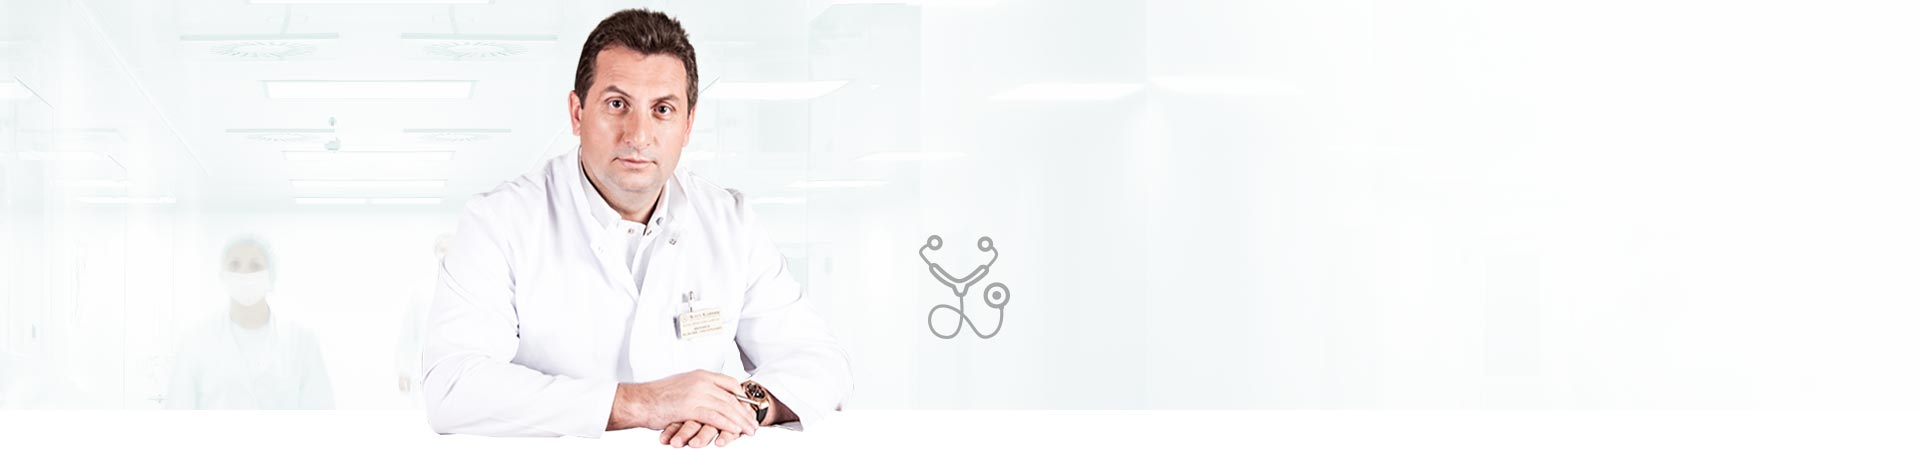 Валерий Якимец пластический хирург